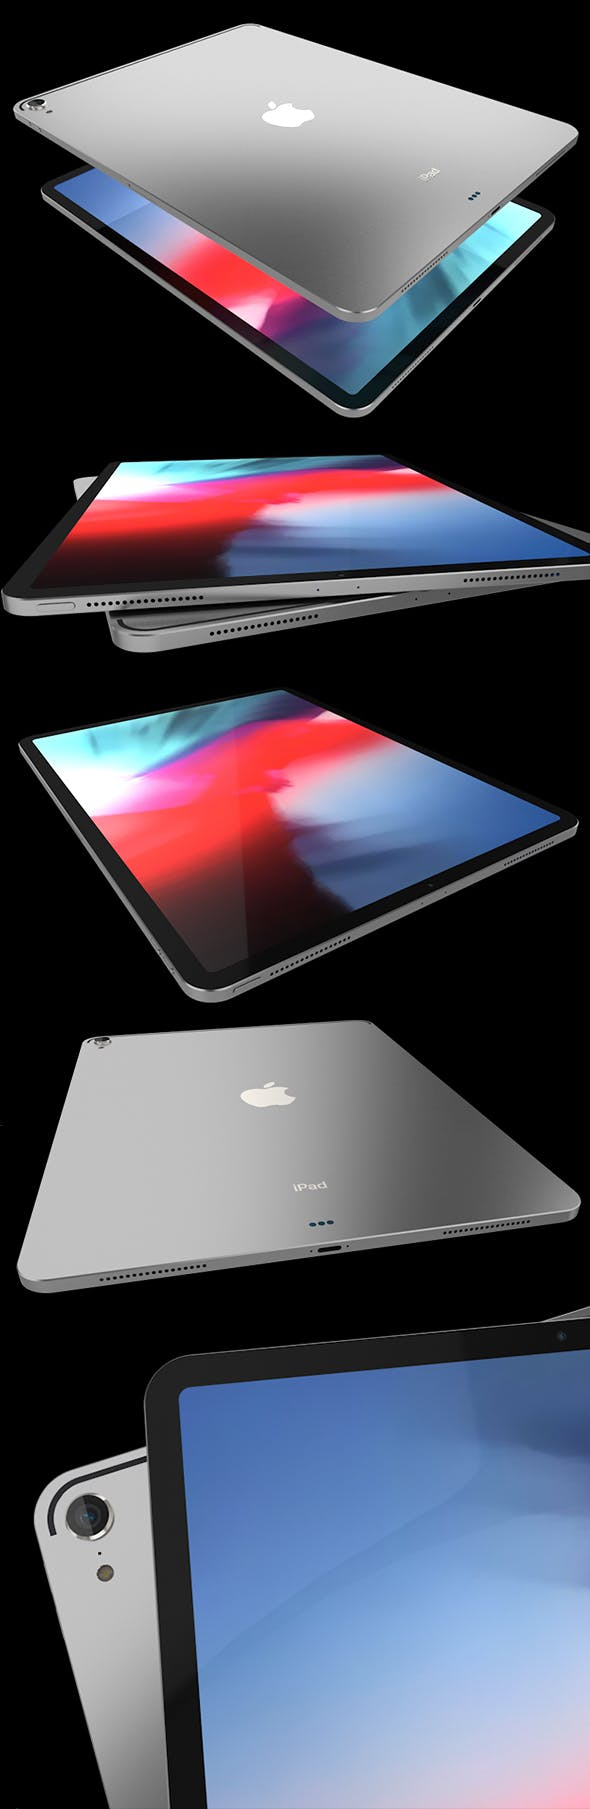 iPad Pro X 2019 - 3DOcean Item for Sale